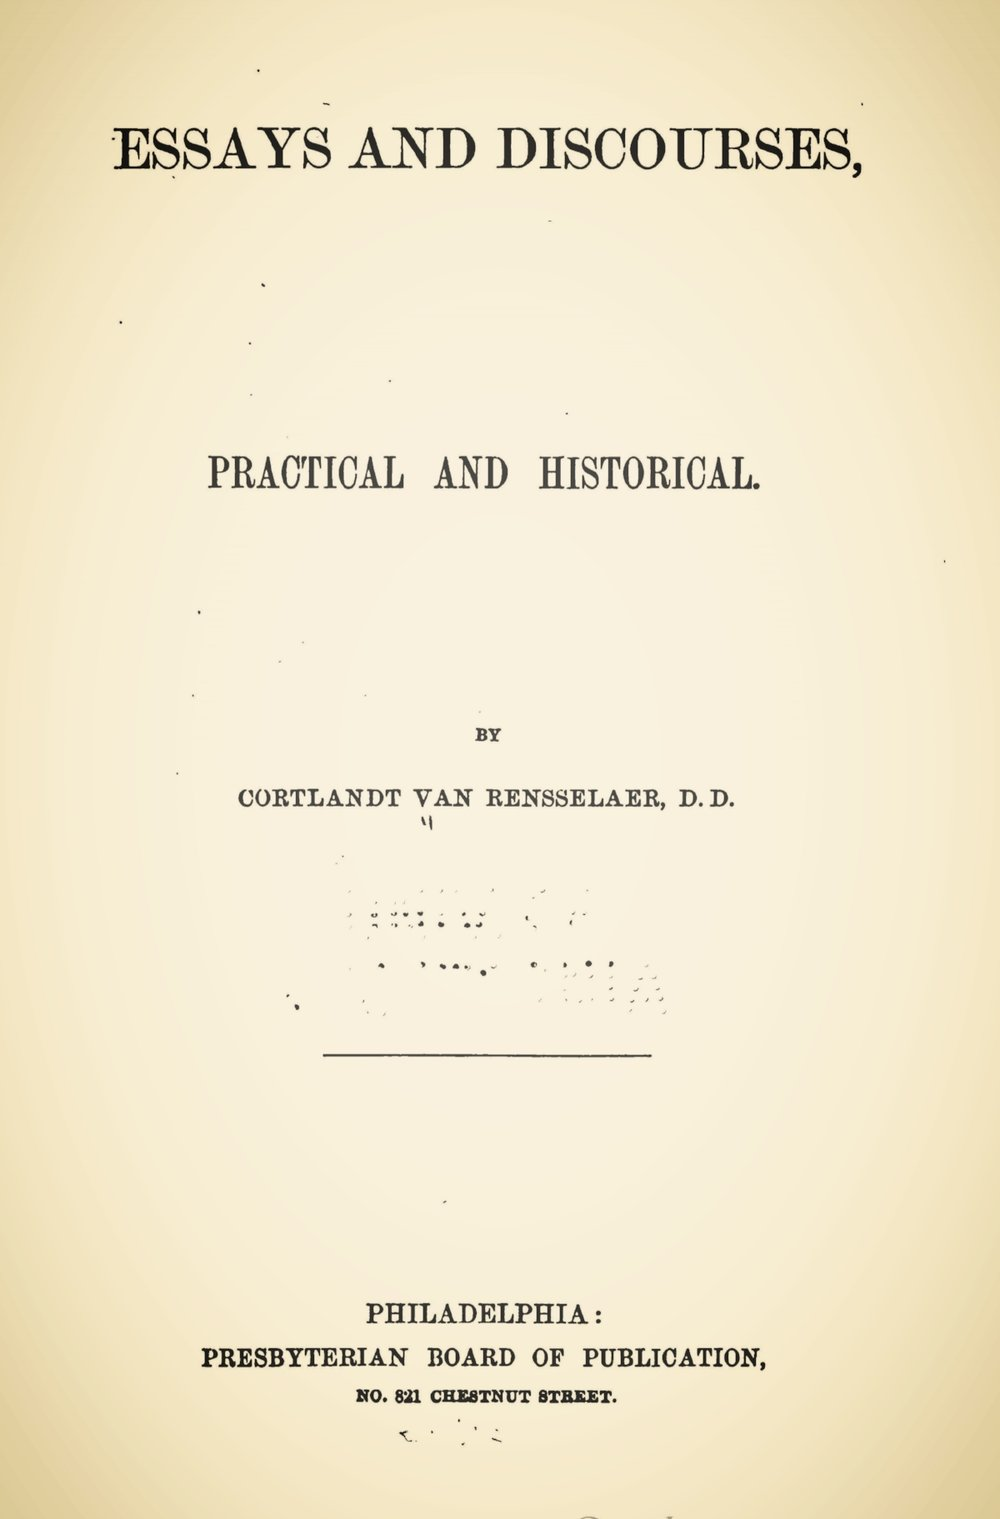 Van Rensselaer, Cortlandt, Essays and Discourses, Practical and Historical Title Page.jpg